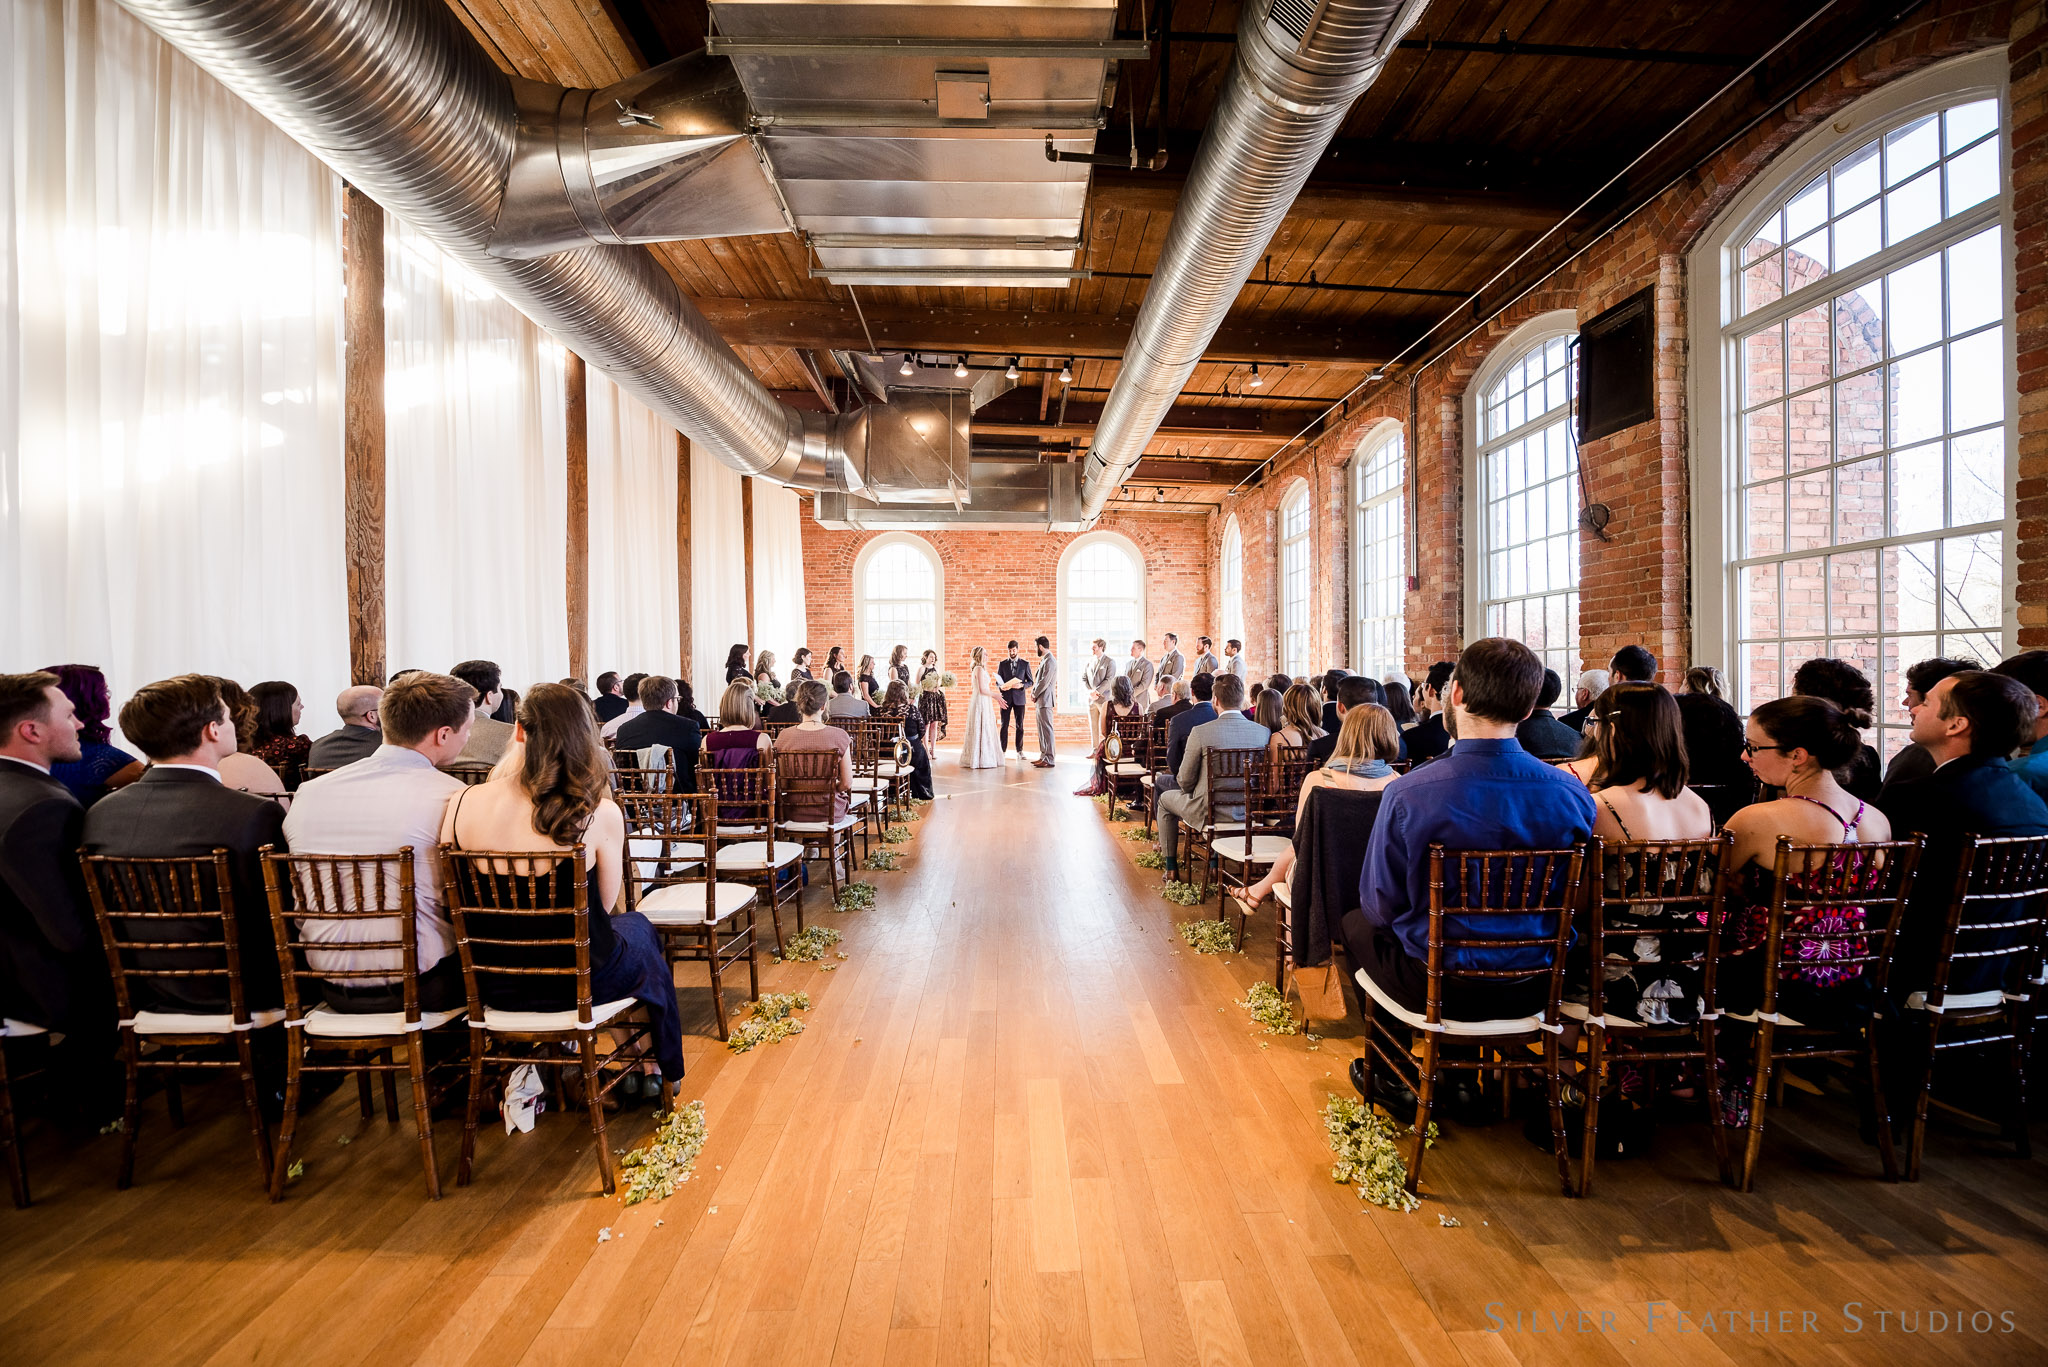 cotton-room-wedding-photography-035.jpg